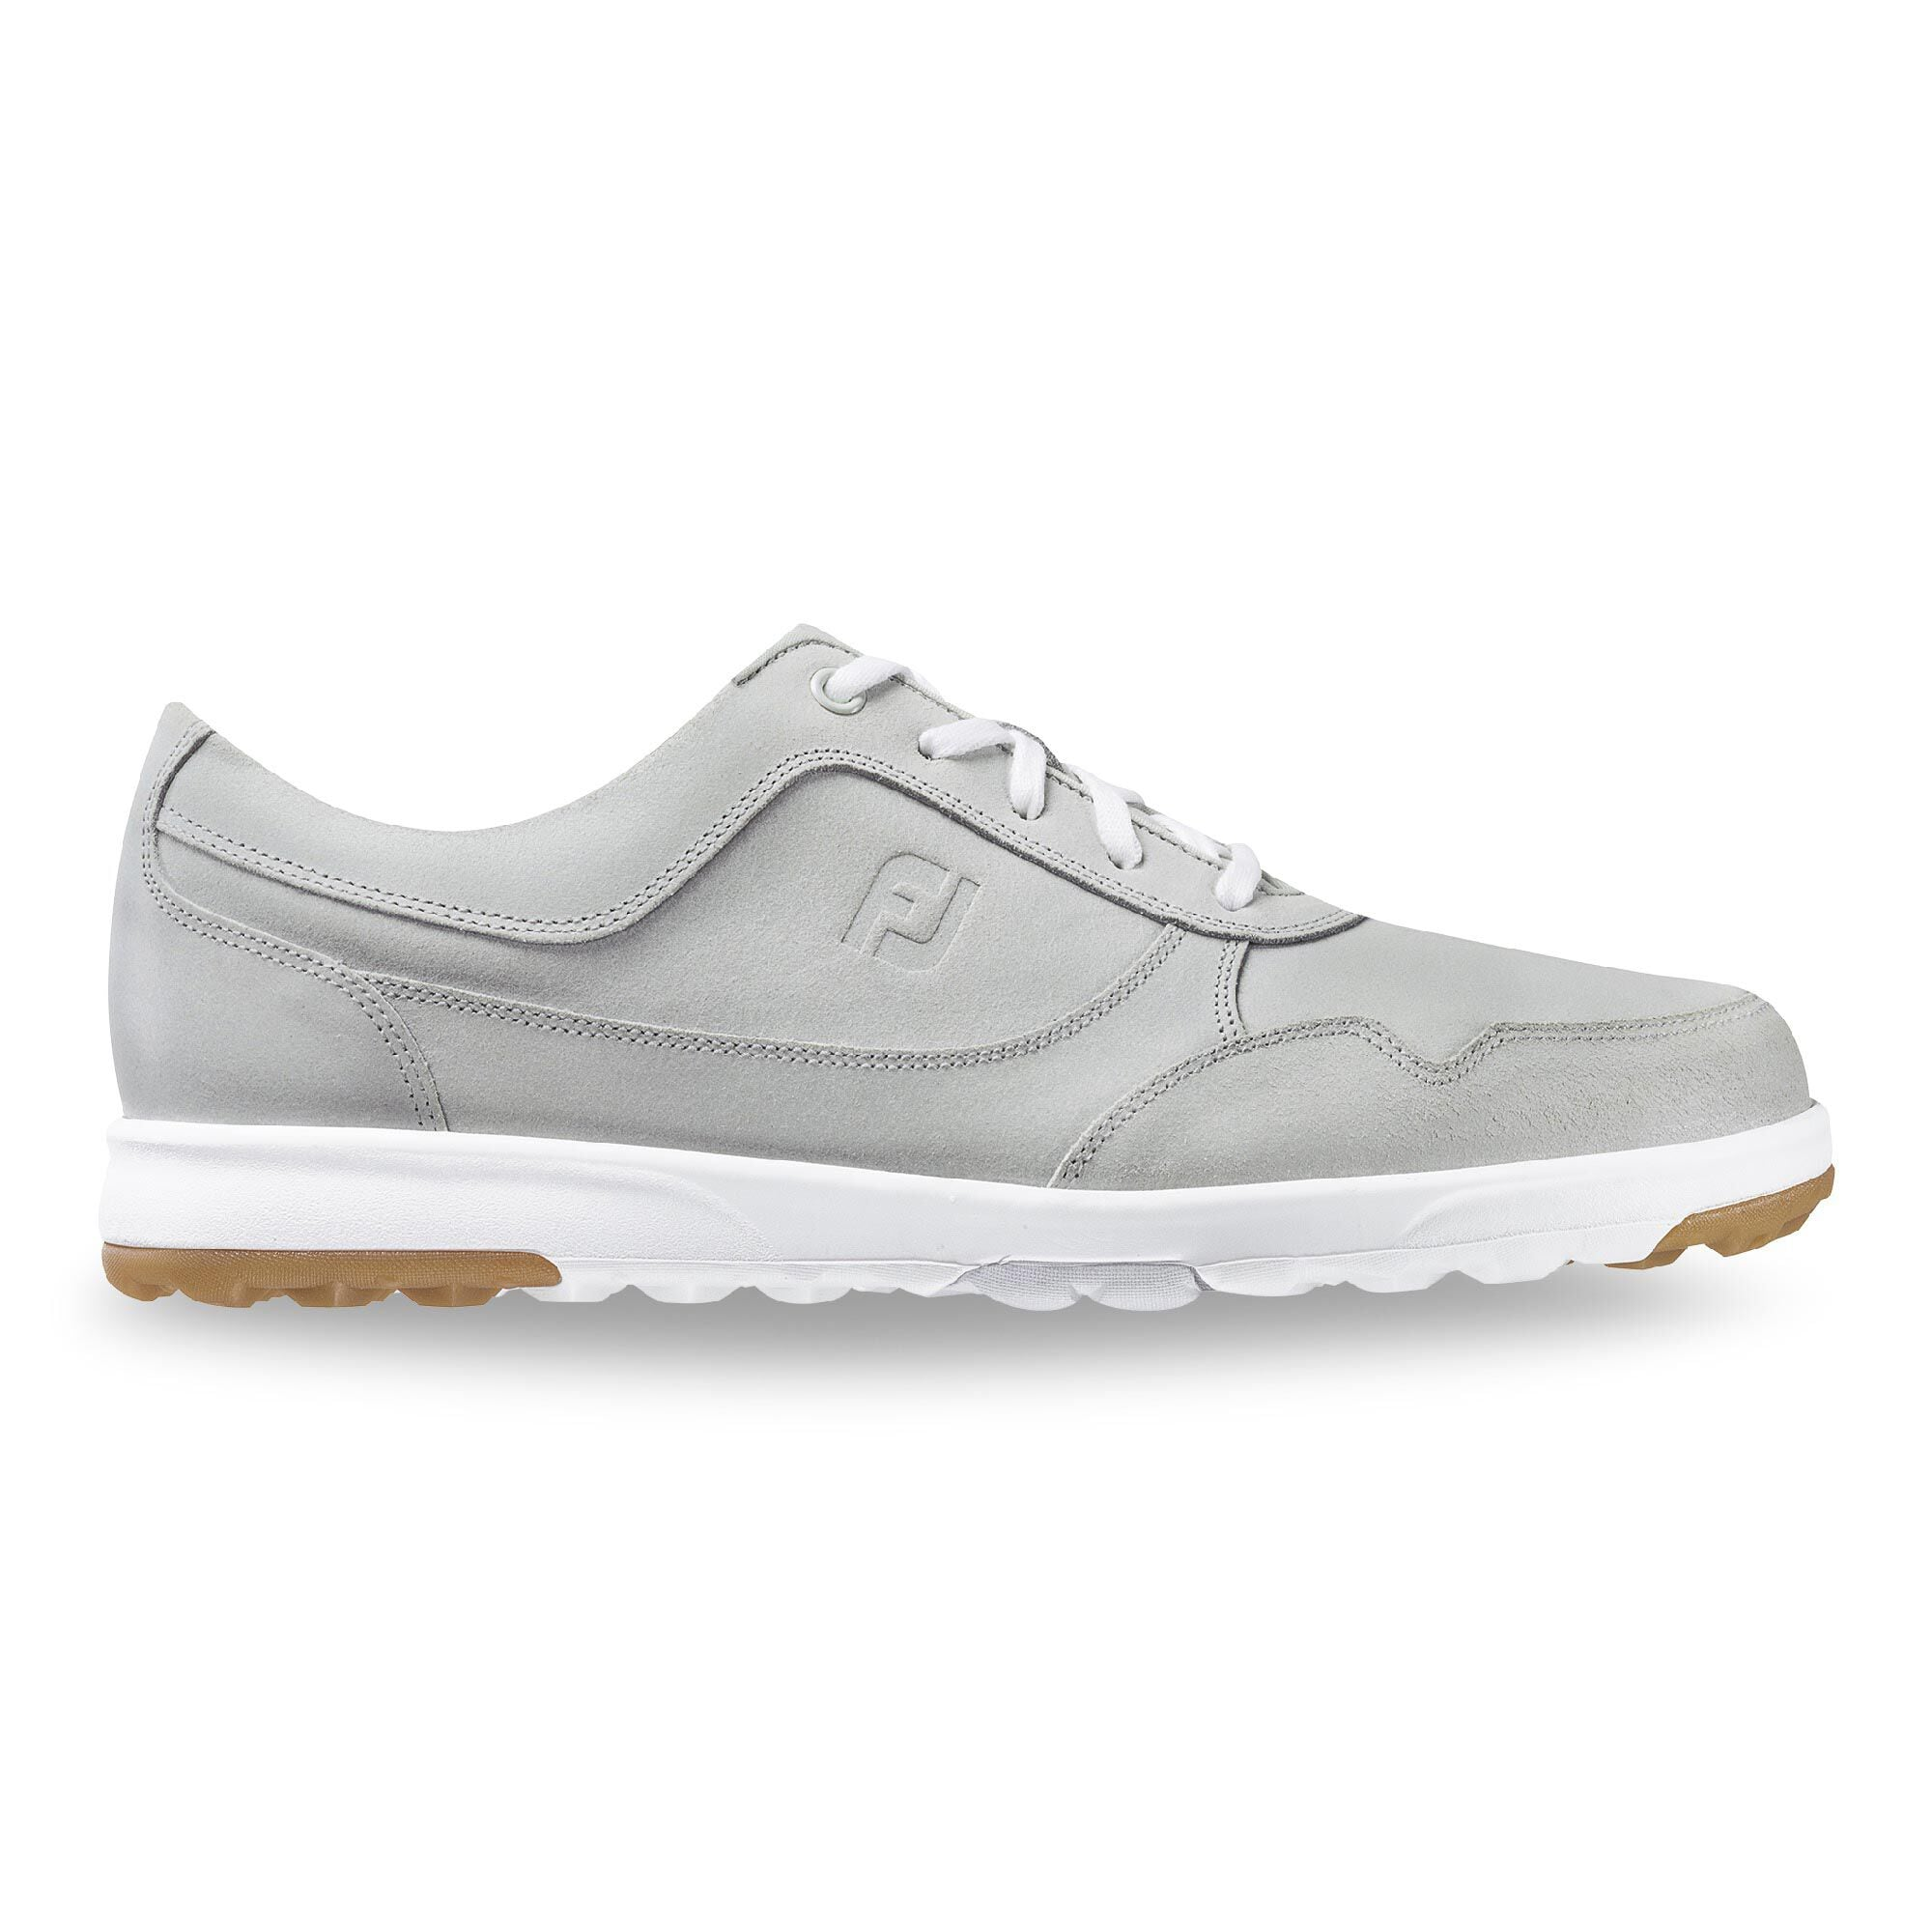 FJ Golf Casual Golf Shoes | FootJoy